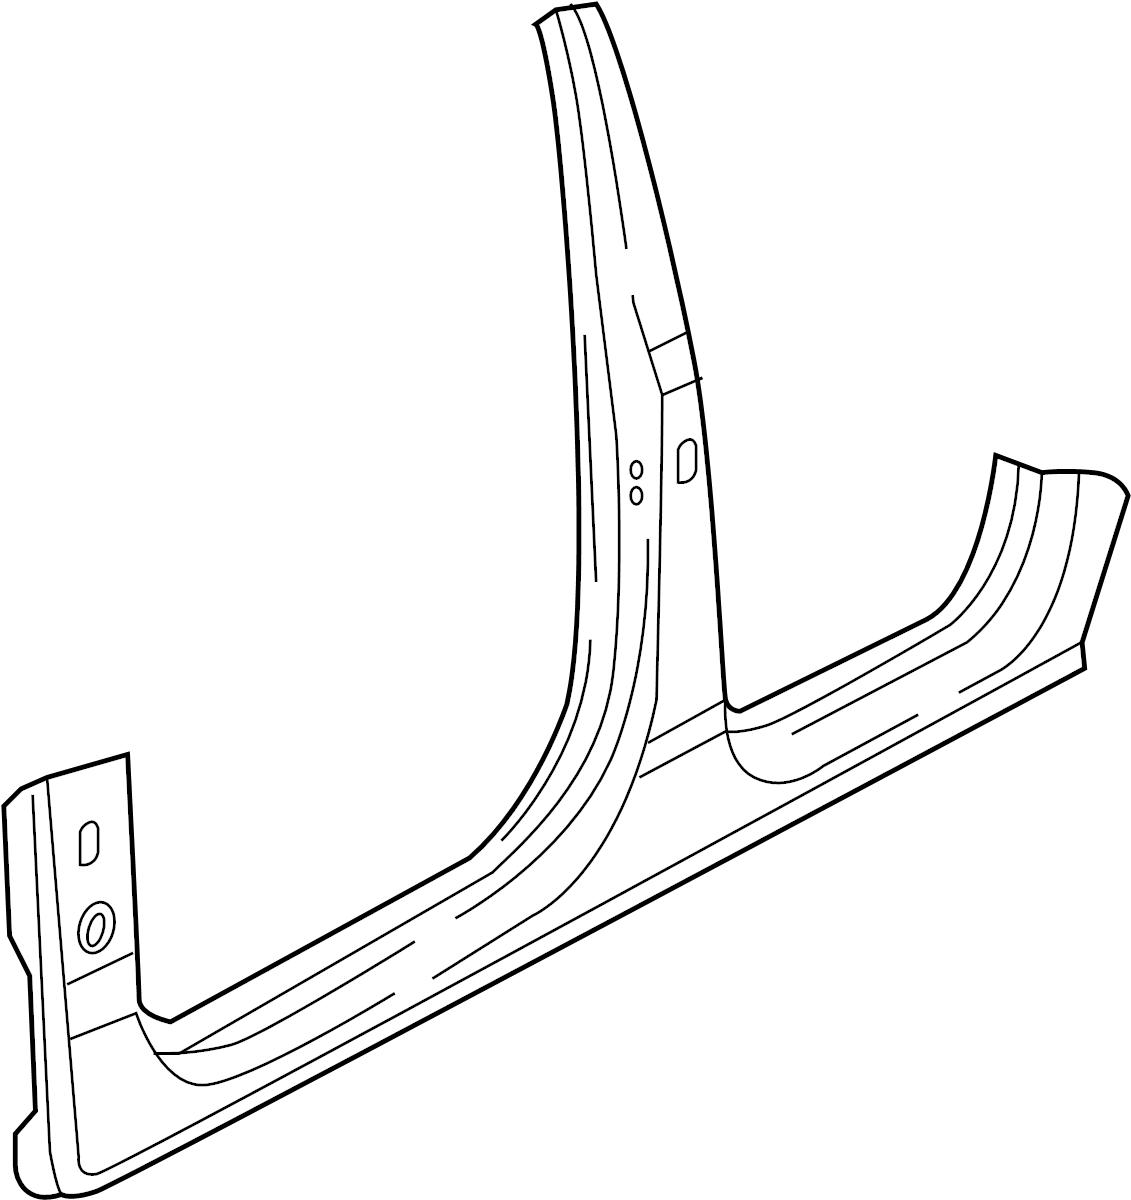 Audi Q7 Rocker Pillar Panel And Body B Center